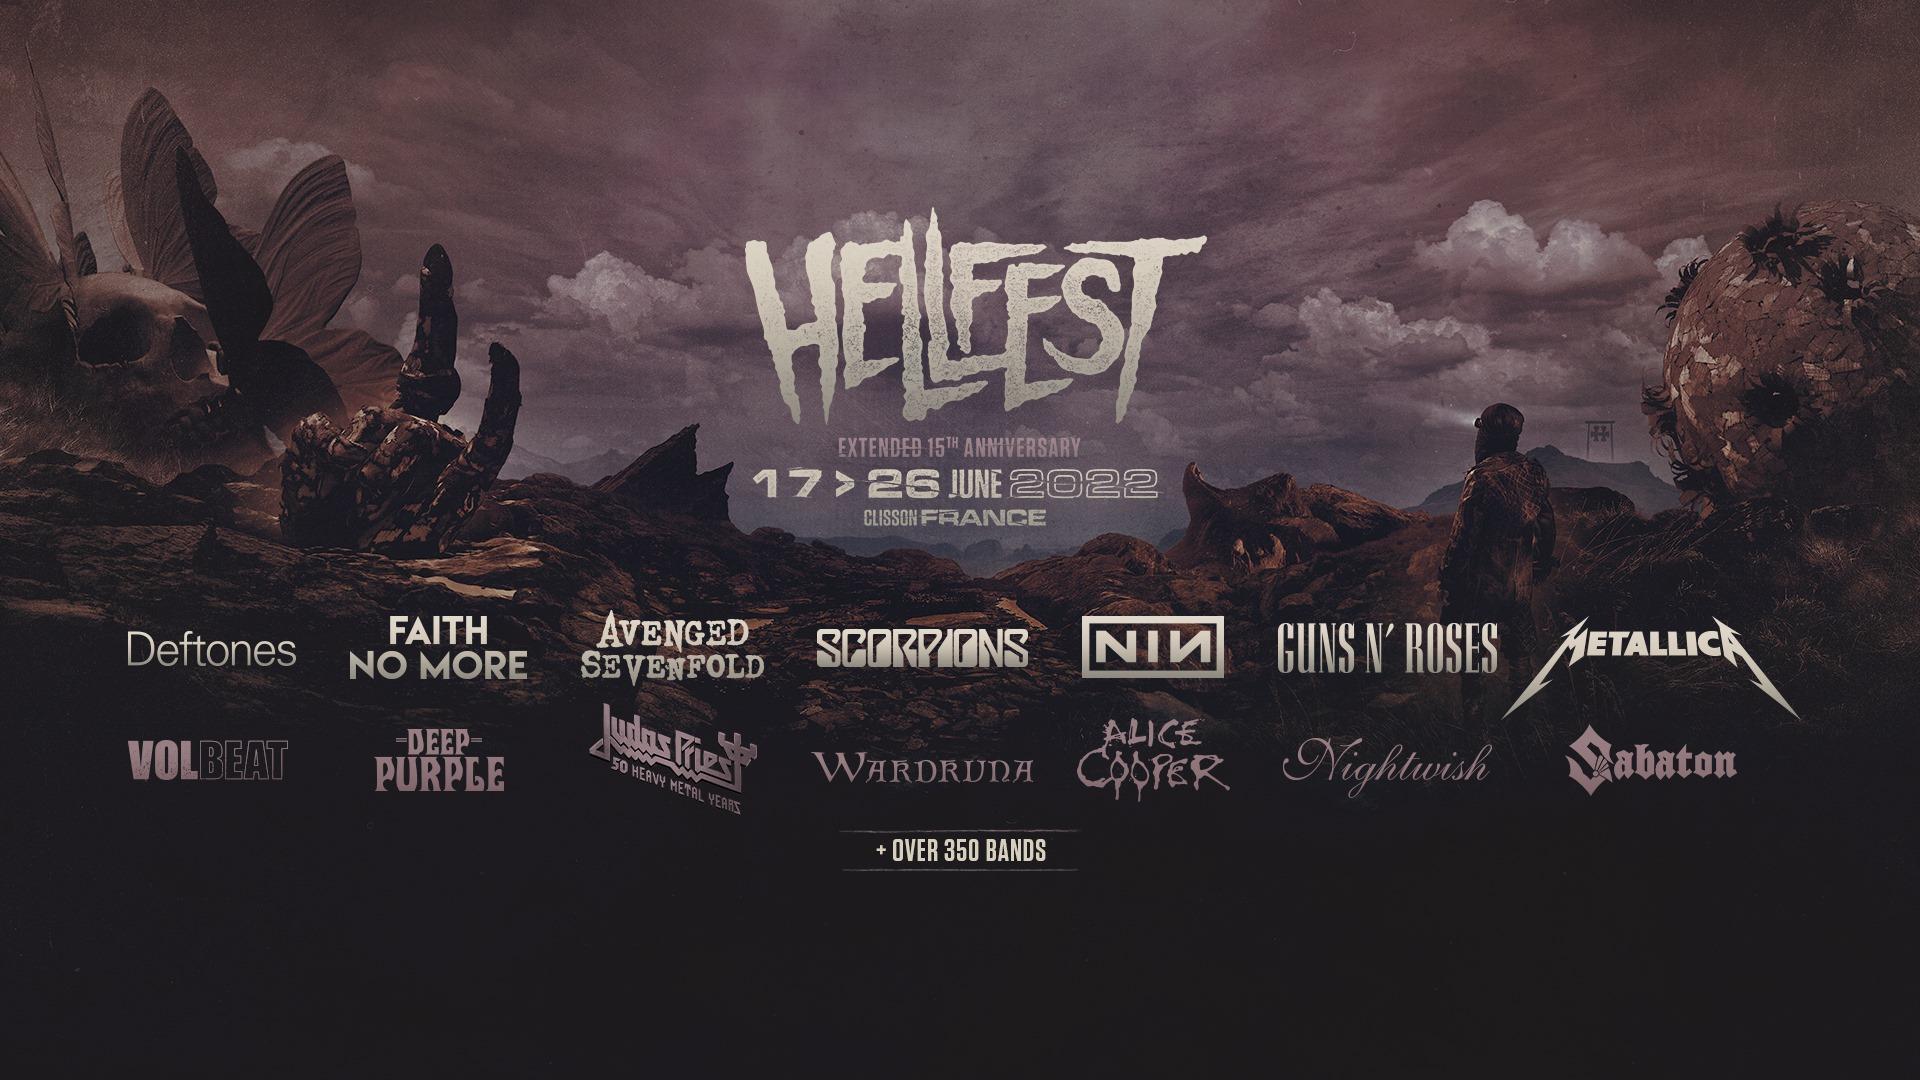 Hellfest 2022 official ban